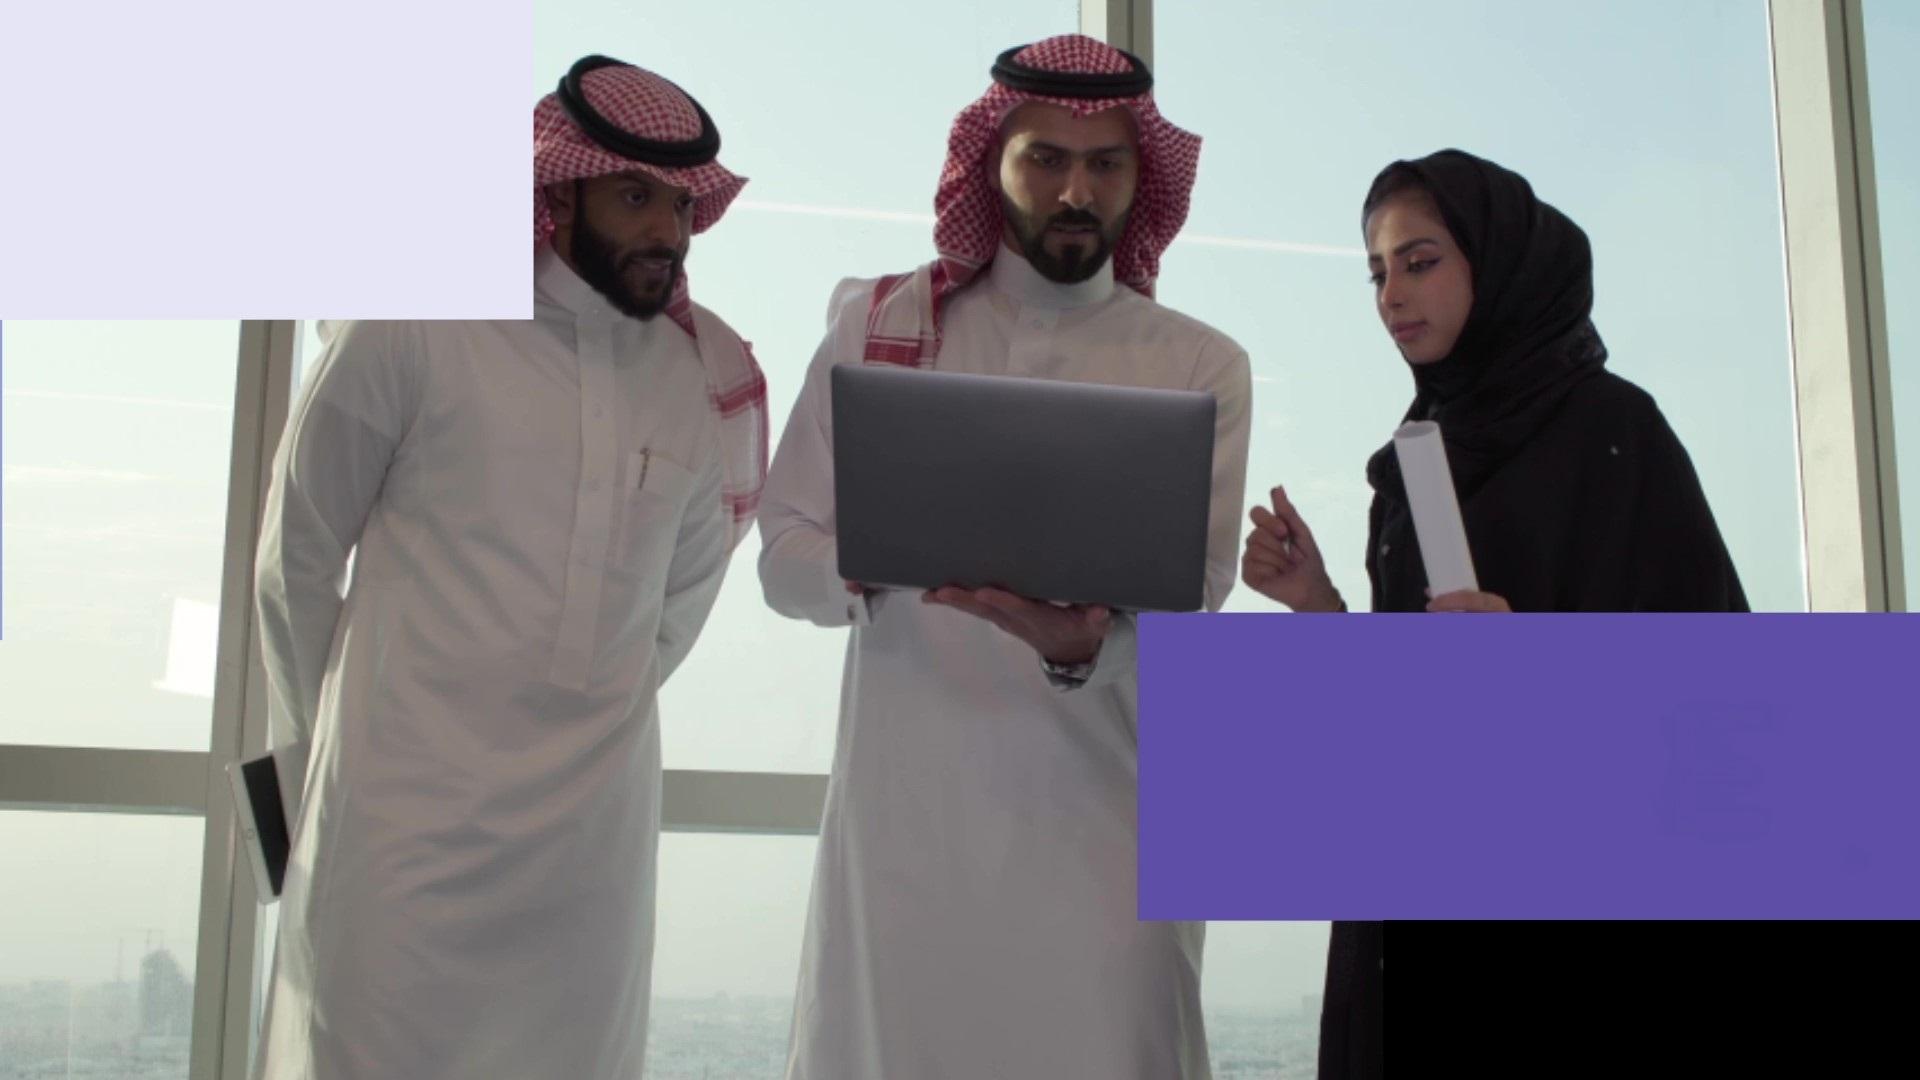 the-entrepreneurs-edge--how-consumers-in-saudi-arabia-support-entrepreneurism